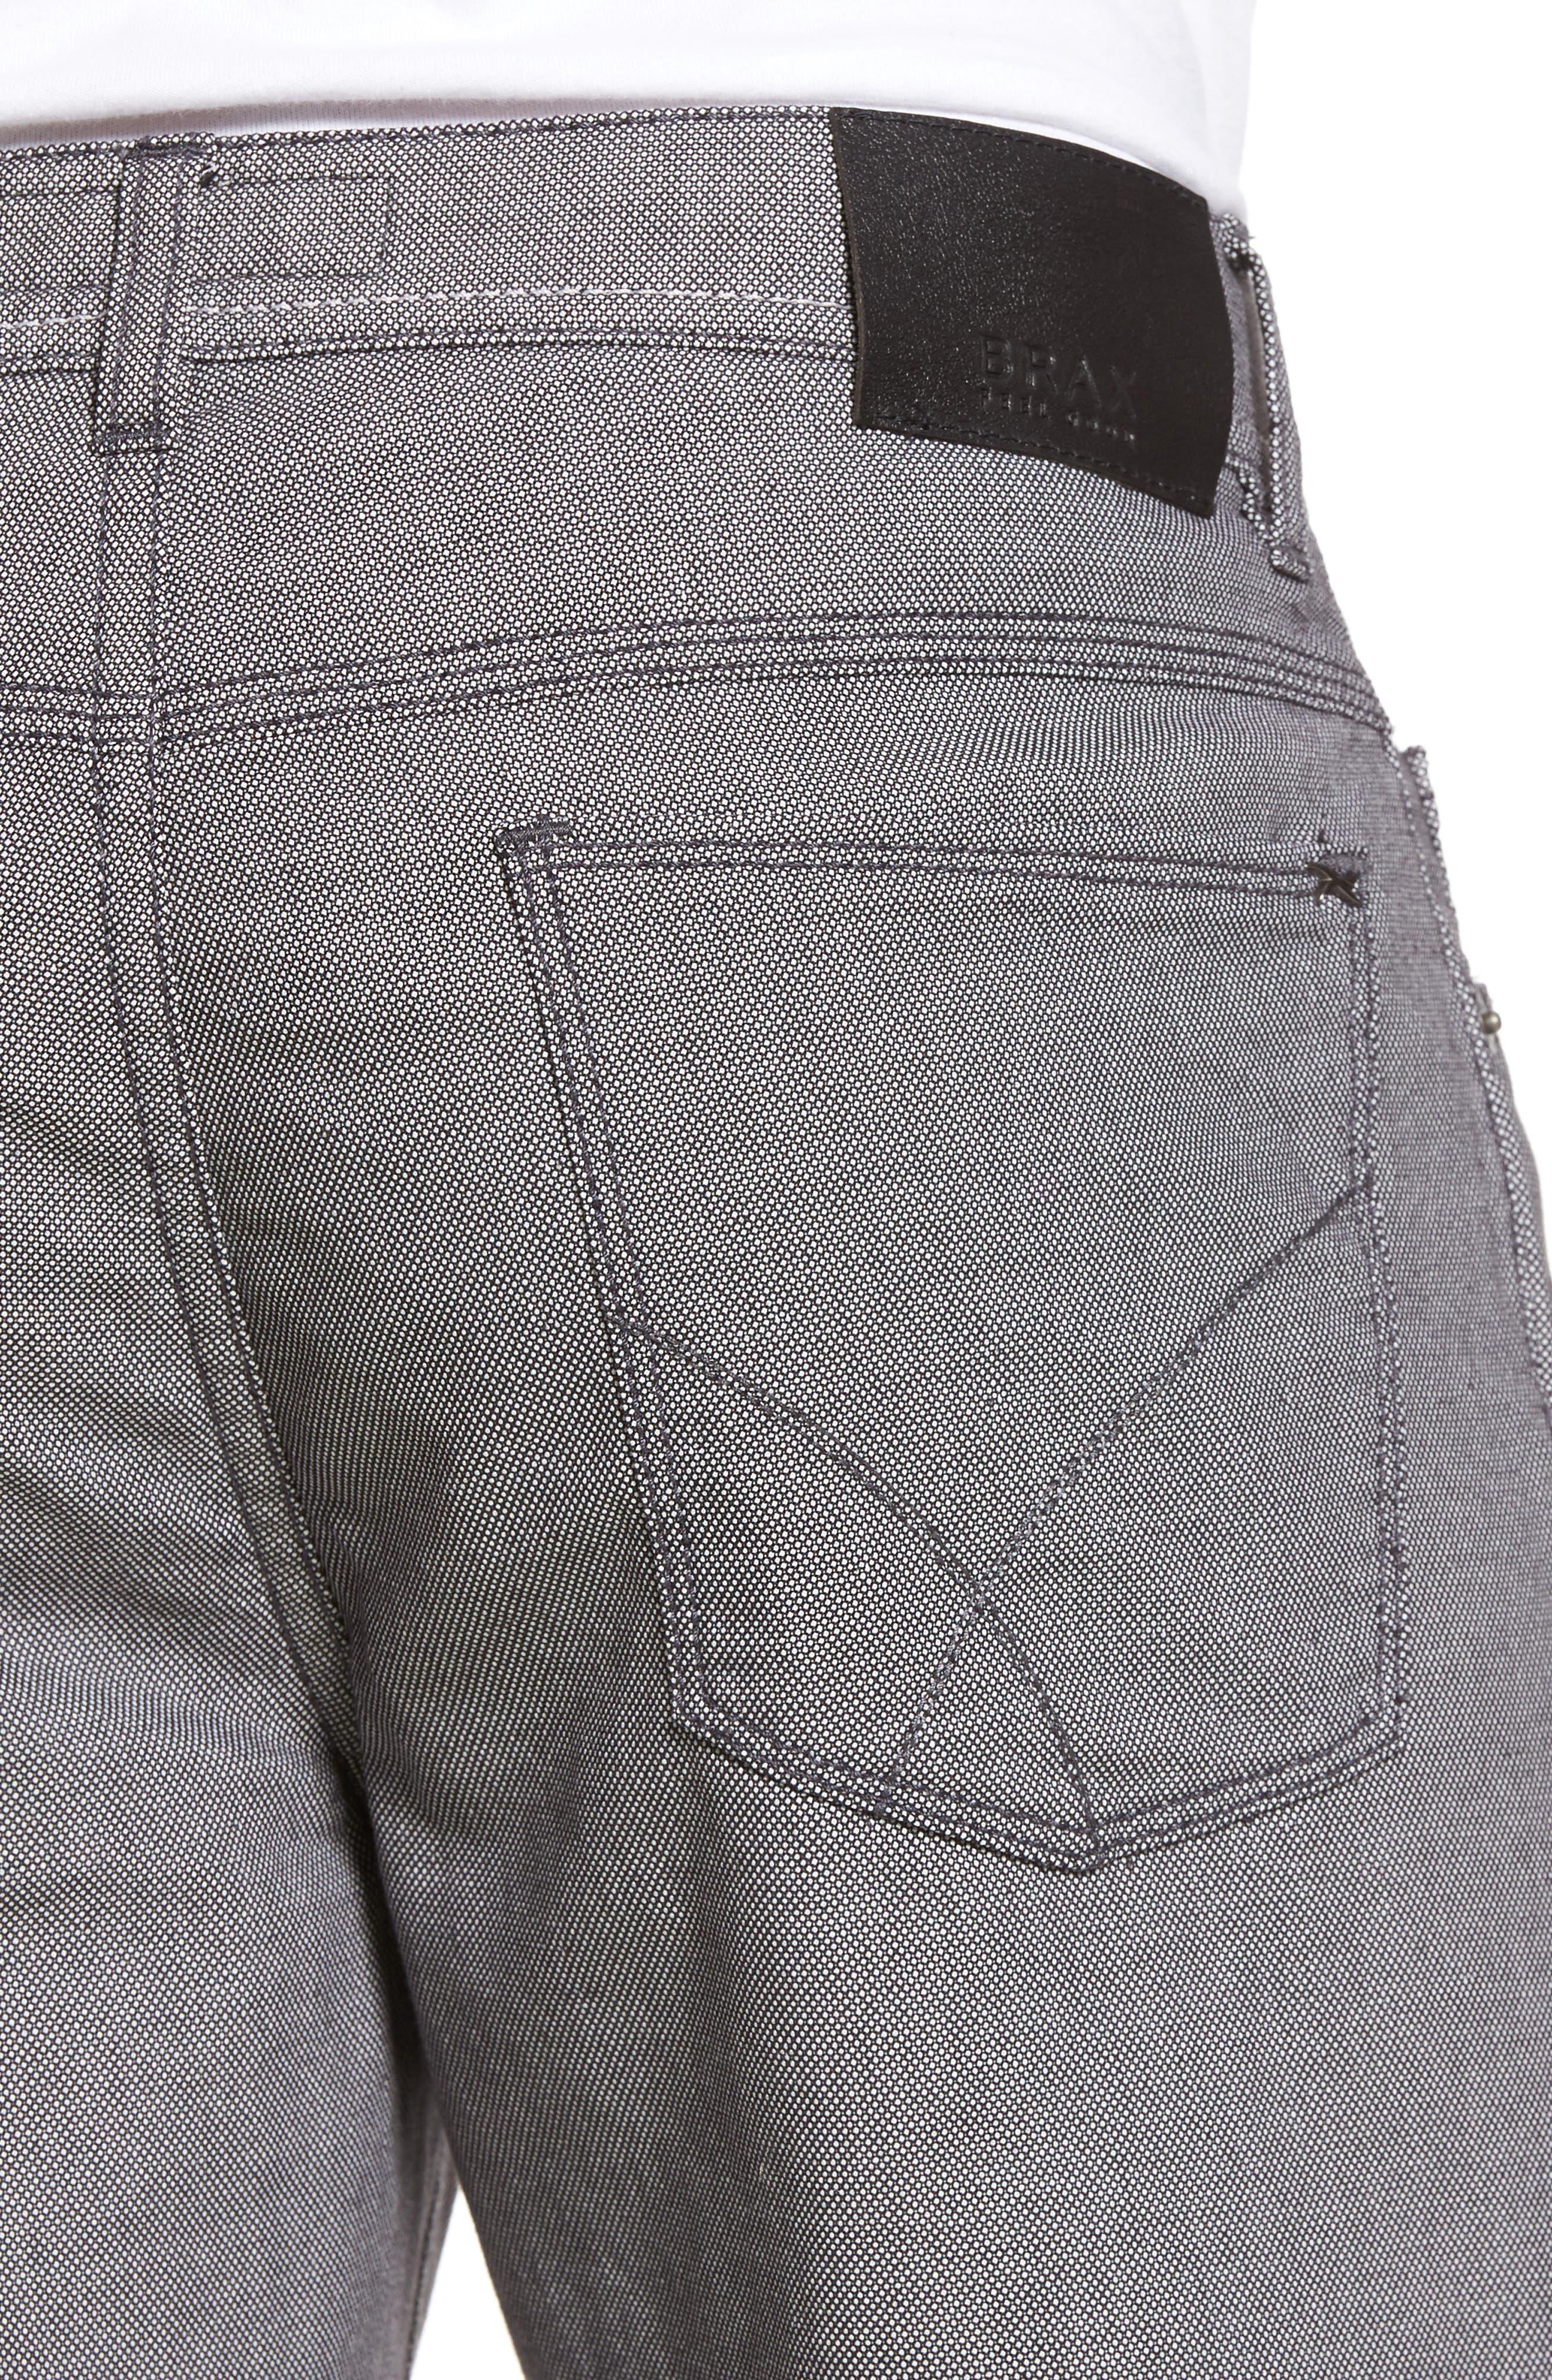 Cooper Bird's Eye Stretch Cotton Pants,                             Alternate thumbnail 4, color,                             Grey